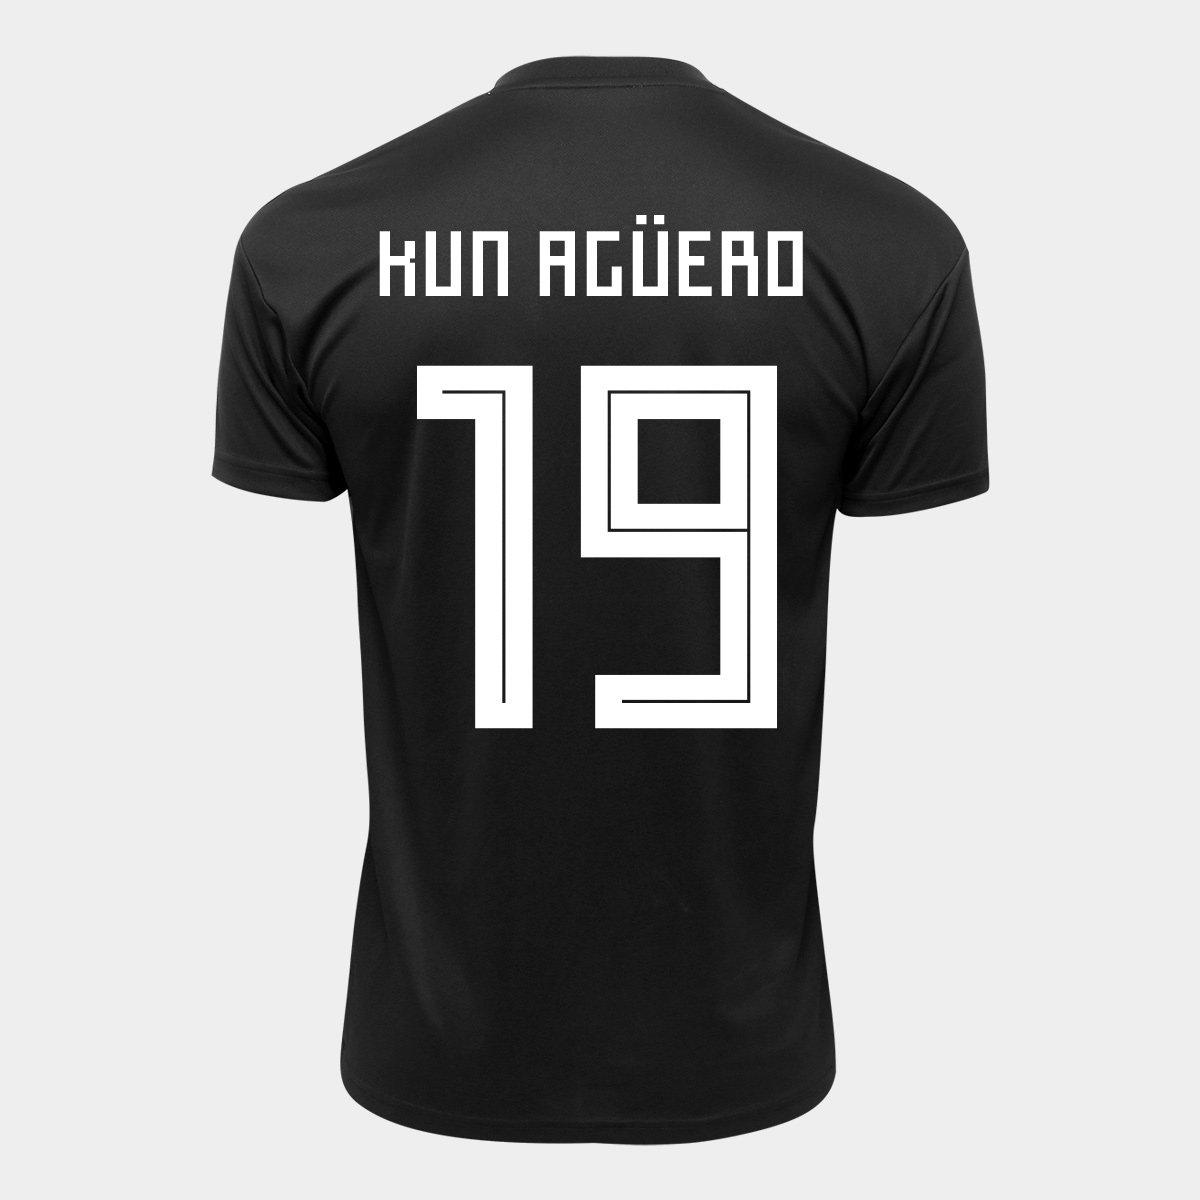 Camisa Seleção Argentina Away 2018 n° 19 Kun Agüero - Torcedor Adidas  Masculina ... 6bb1a2d94fe3d